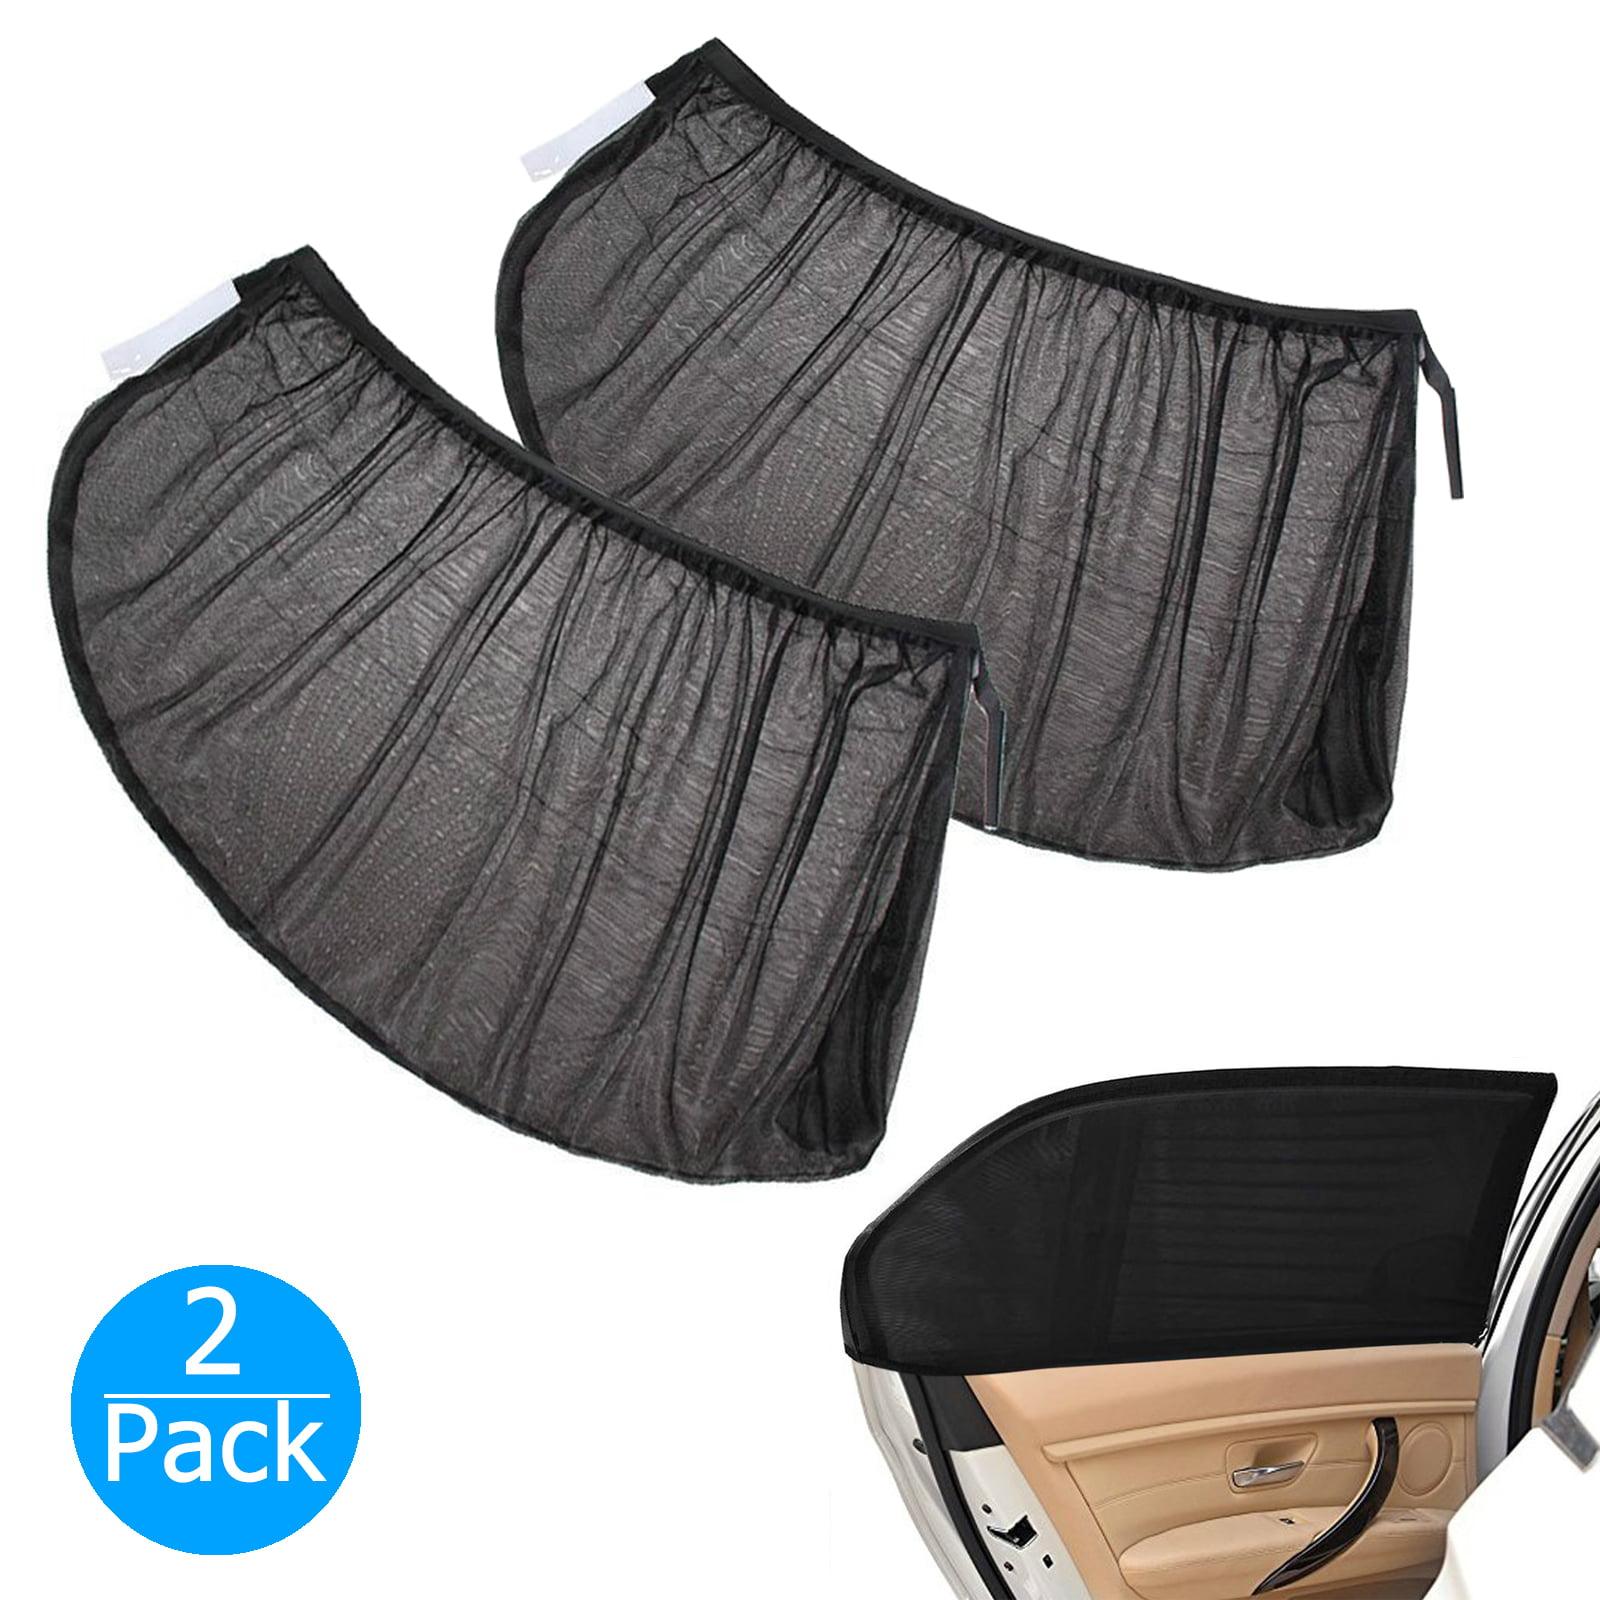 2-pack Car SUV Premium Rear Side Window Sun Visor Shade Mesh Cover Shield Sunshade UV Protector, Universal Fit Car ( Baby Sun Shade Travel Kit Bundle )